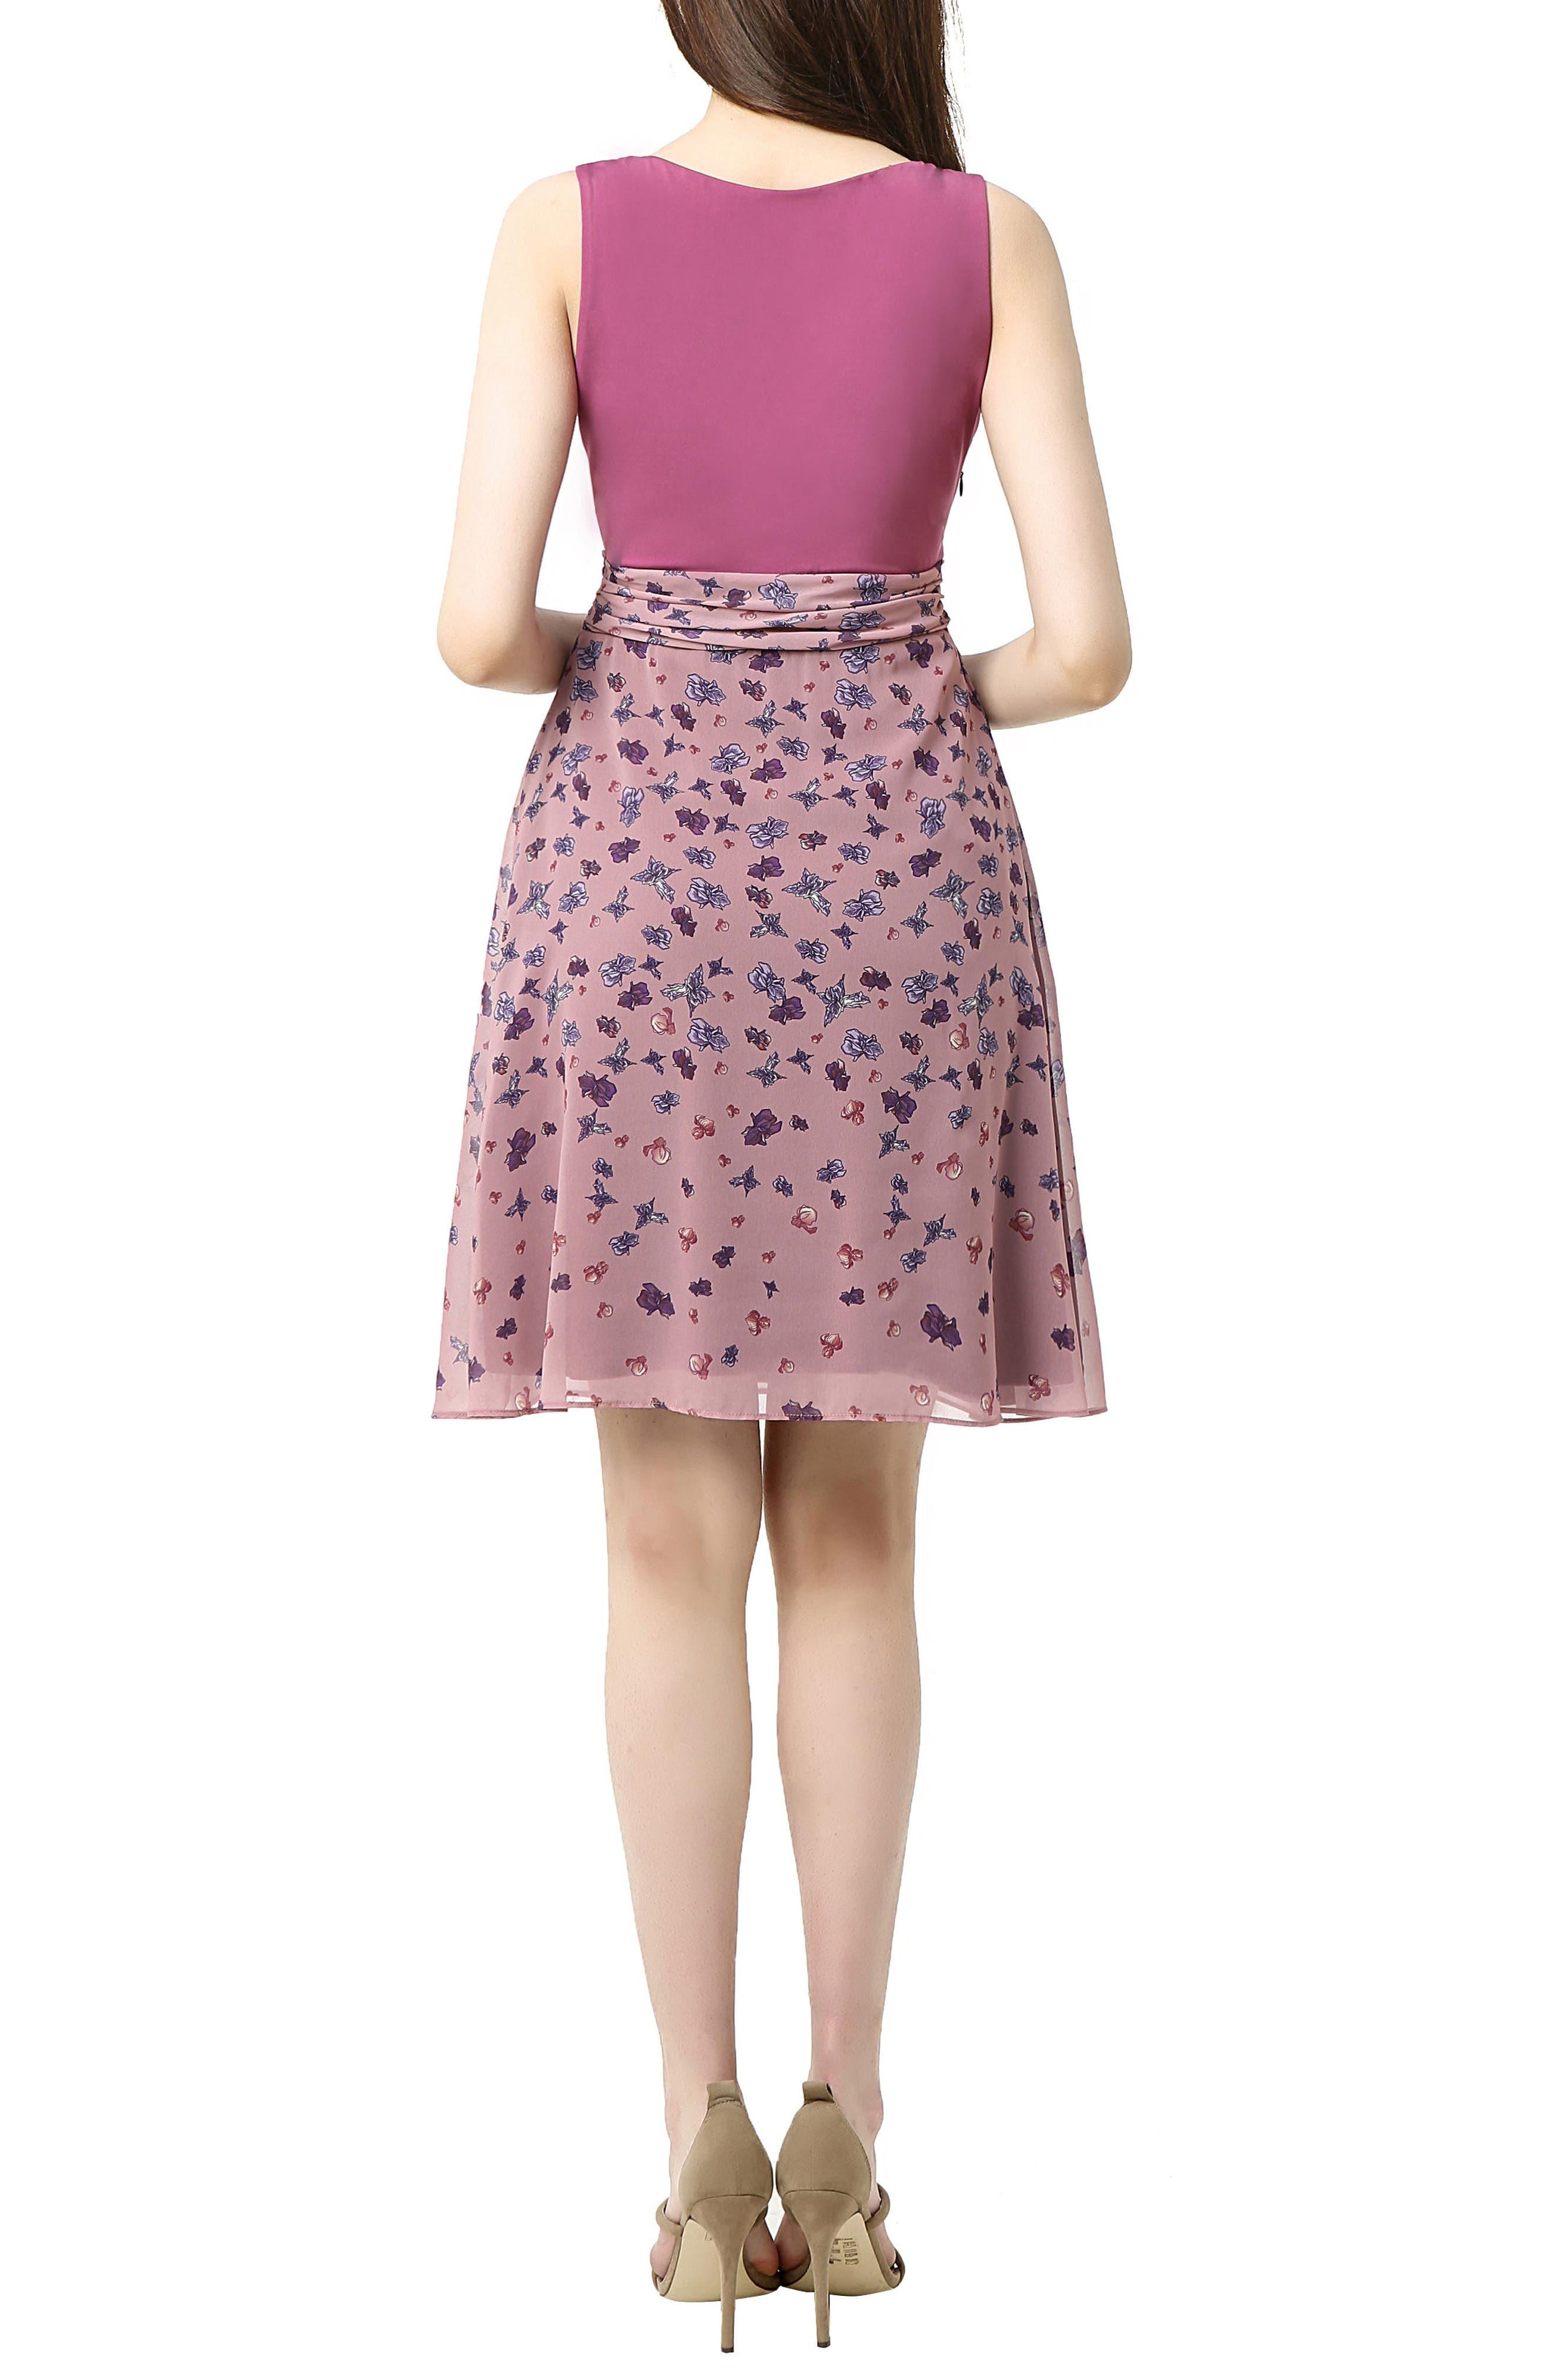 Libby Print Skirt Maternity Dress,                             Alternate thumbnail 2, color,                             ROSE PINK